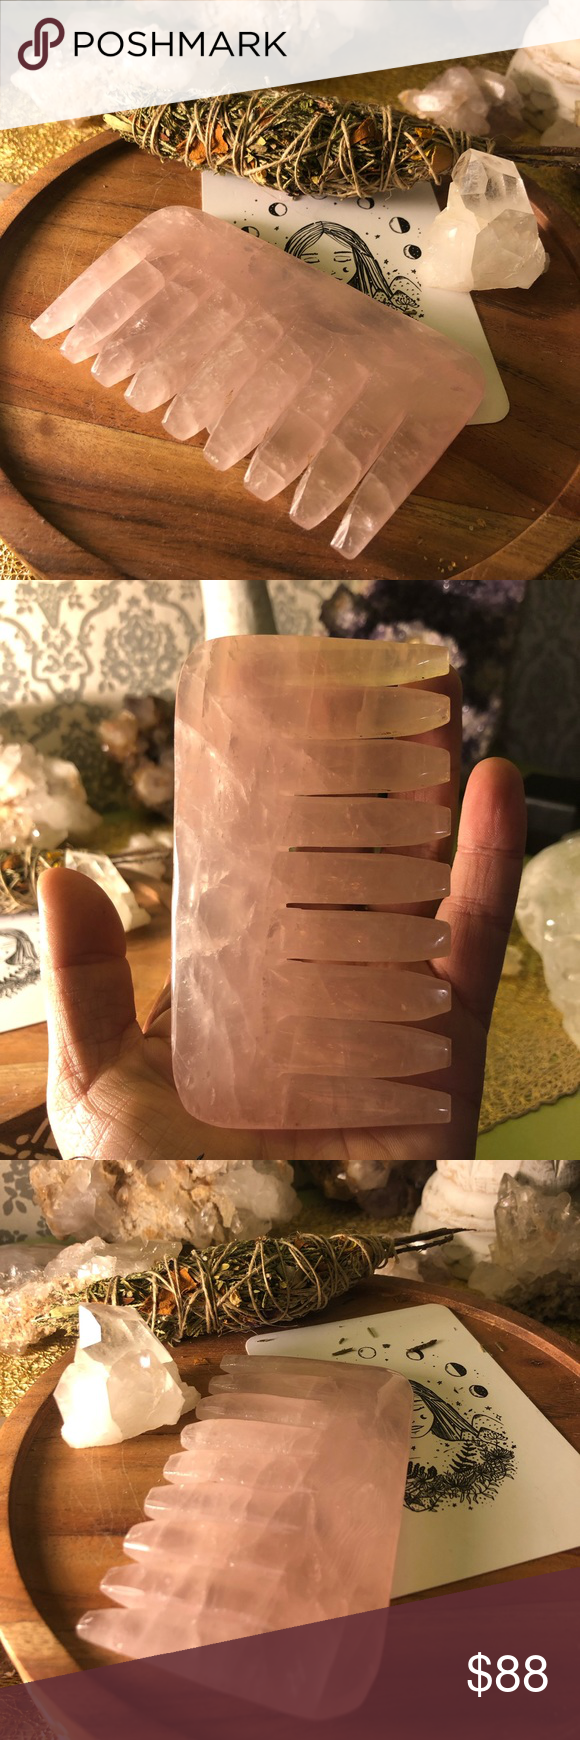 SALE ‼️ Rose quartz healing crystal hair comb Rose